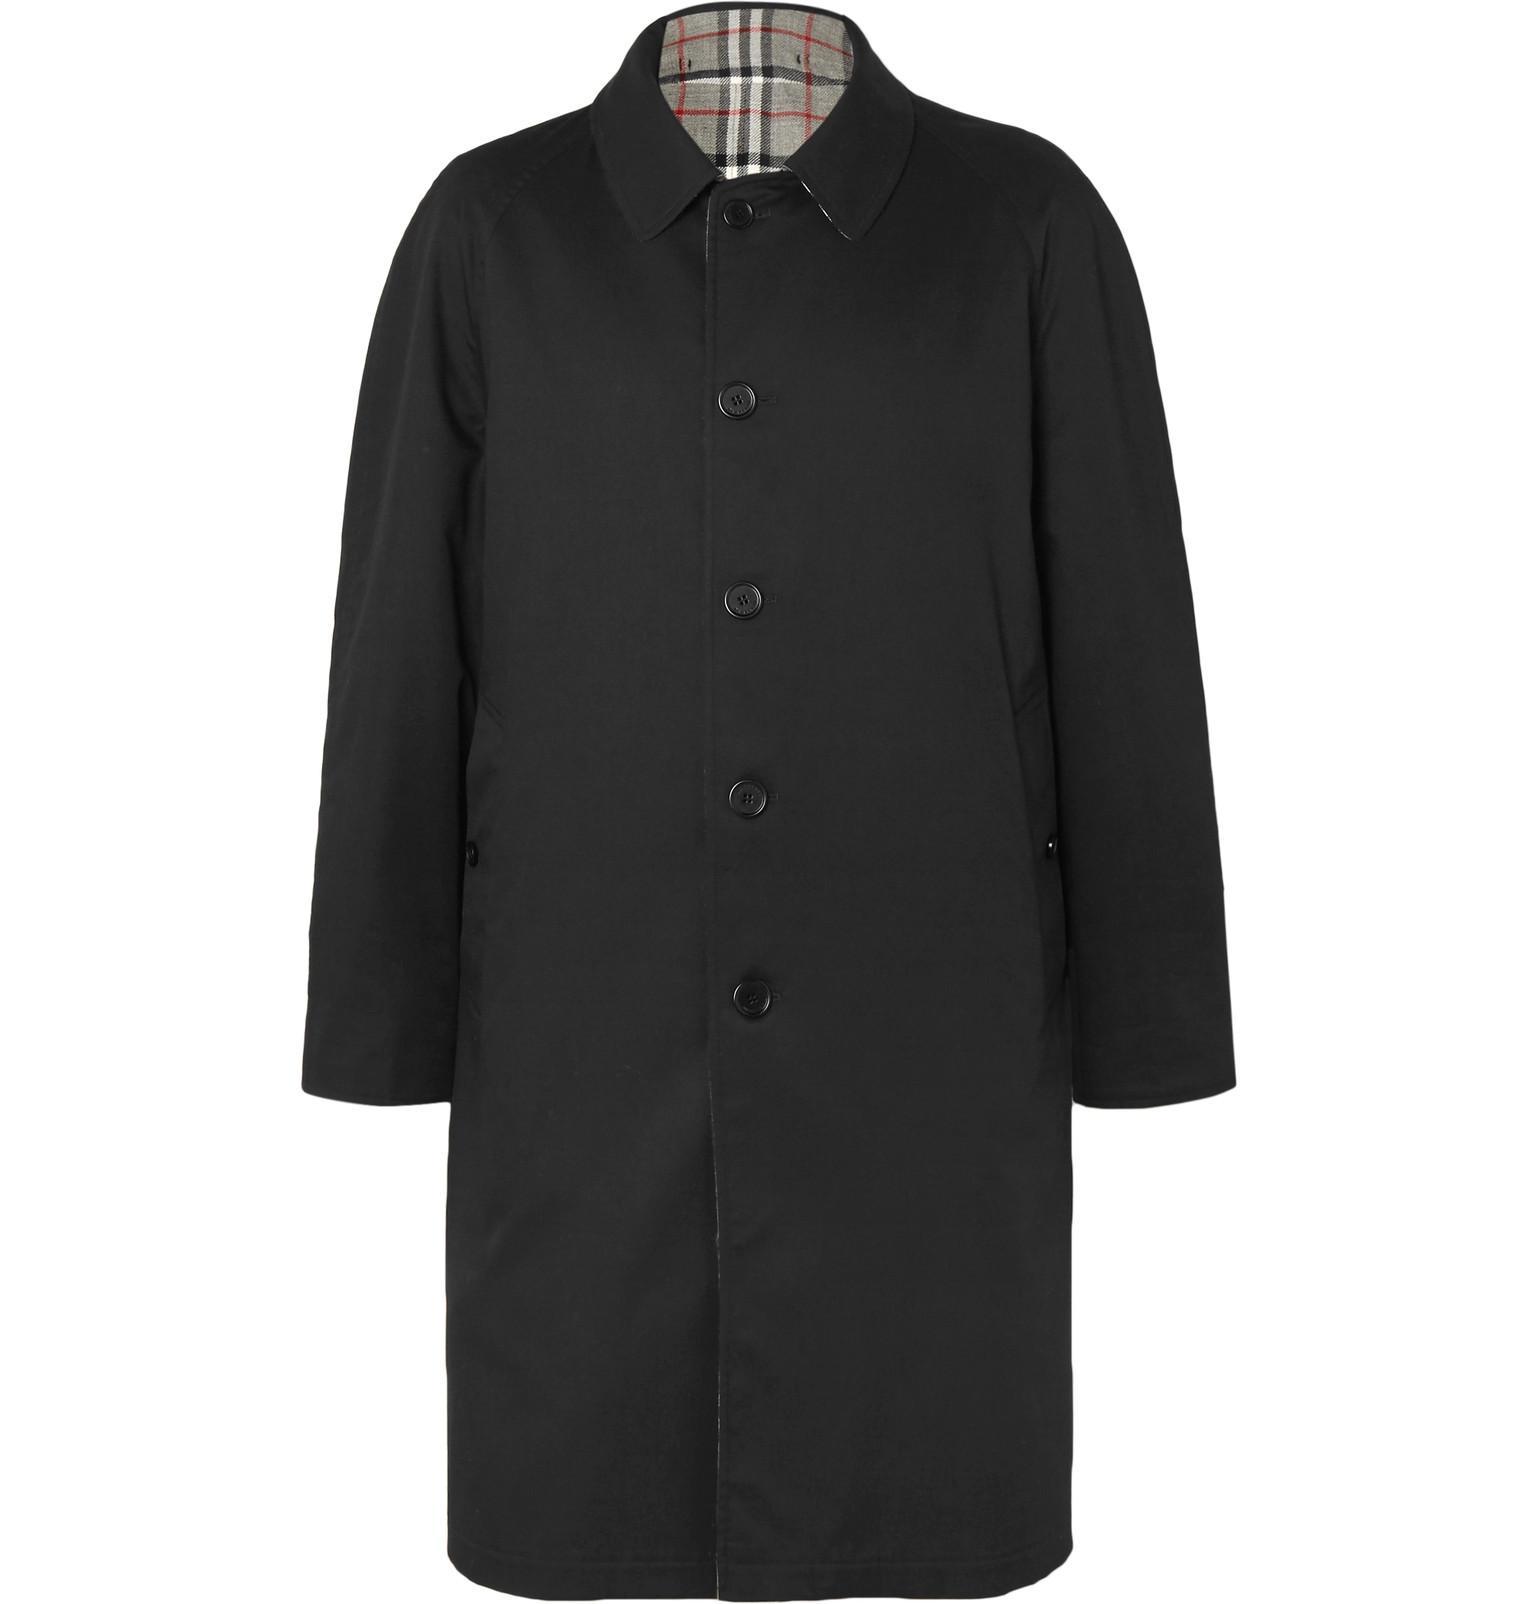 657fadd4e503 Burberry - Black Reversible Checked Wool And Gabardine Coat for Men - Lyst